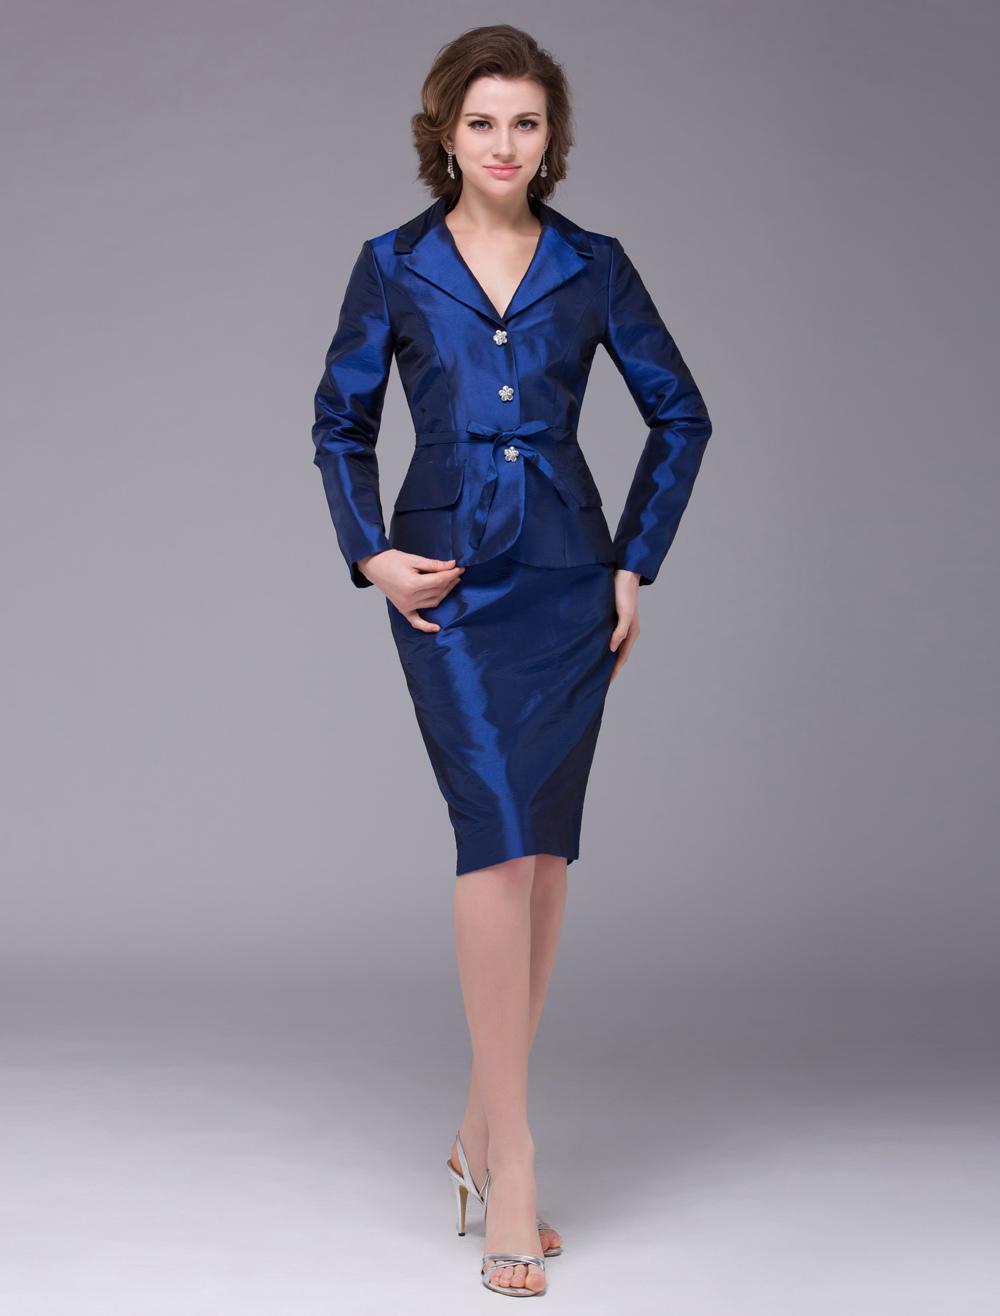 Royal Blue Sheath Taffeta Rhinestone Long Sleeves Bridal Mother Dress with V-Neck